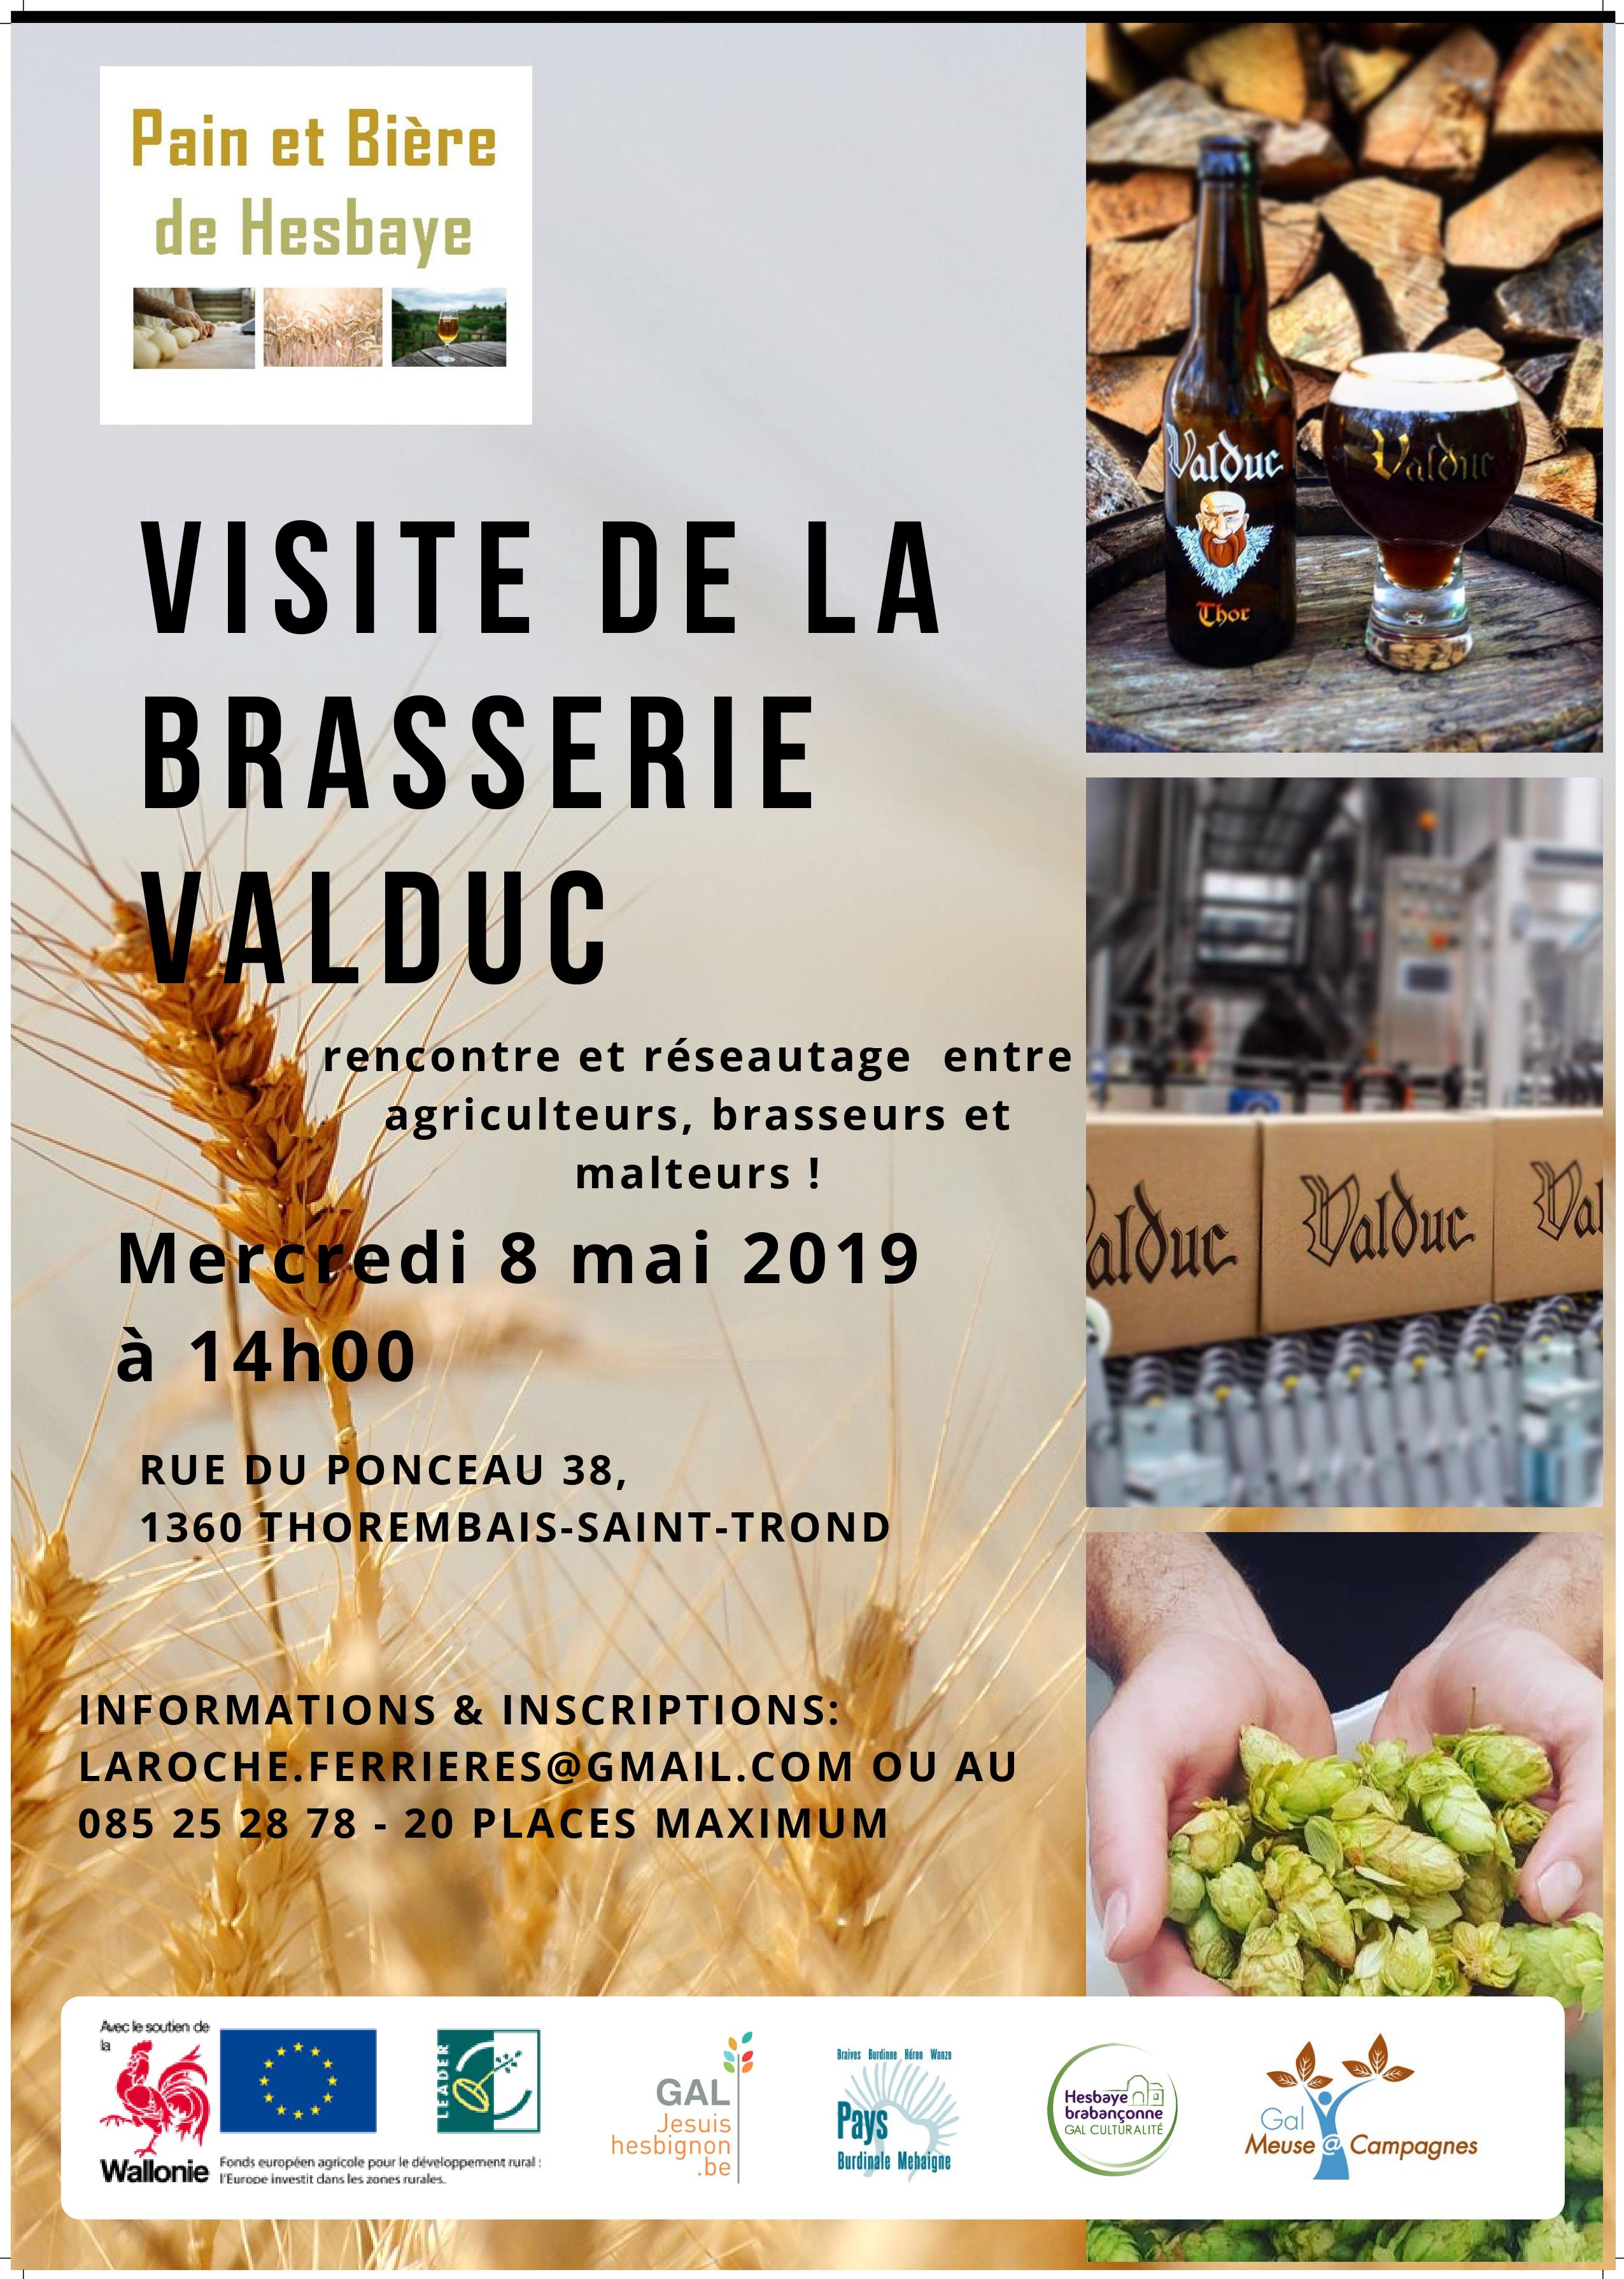 Visite de la brasserie Valduc